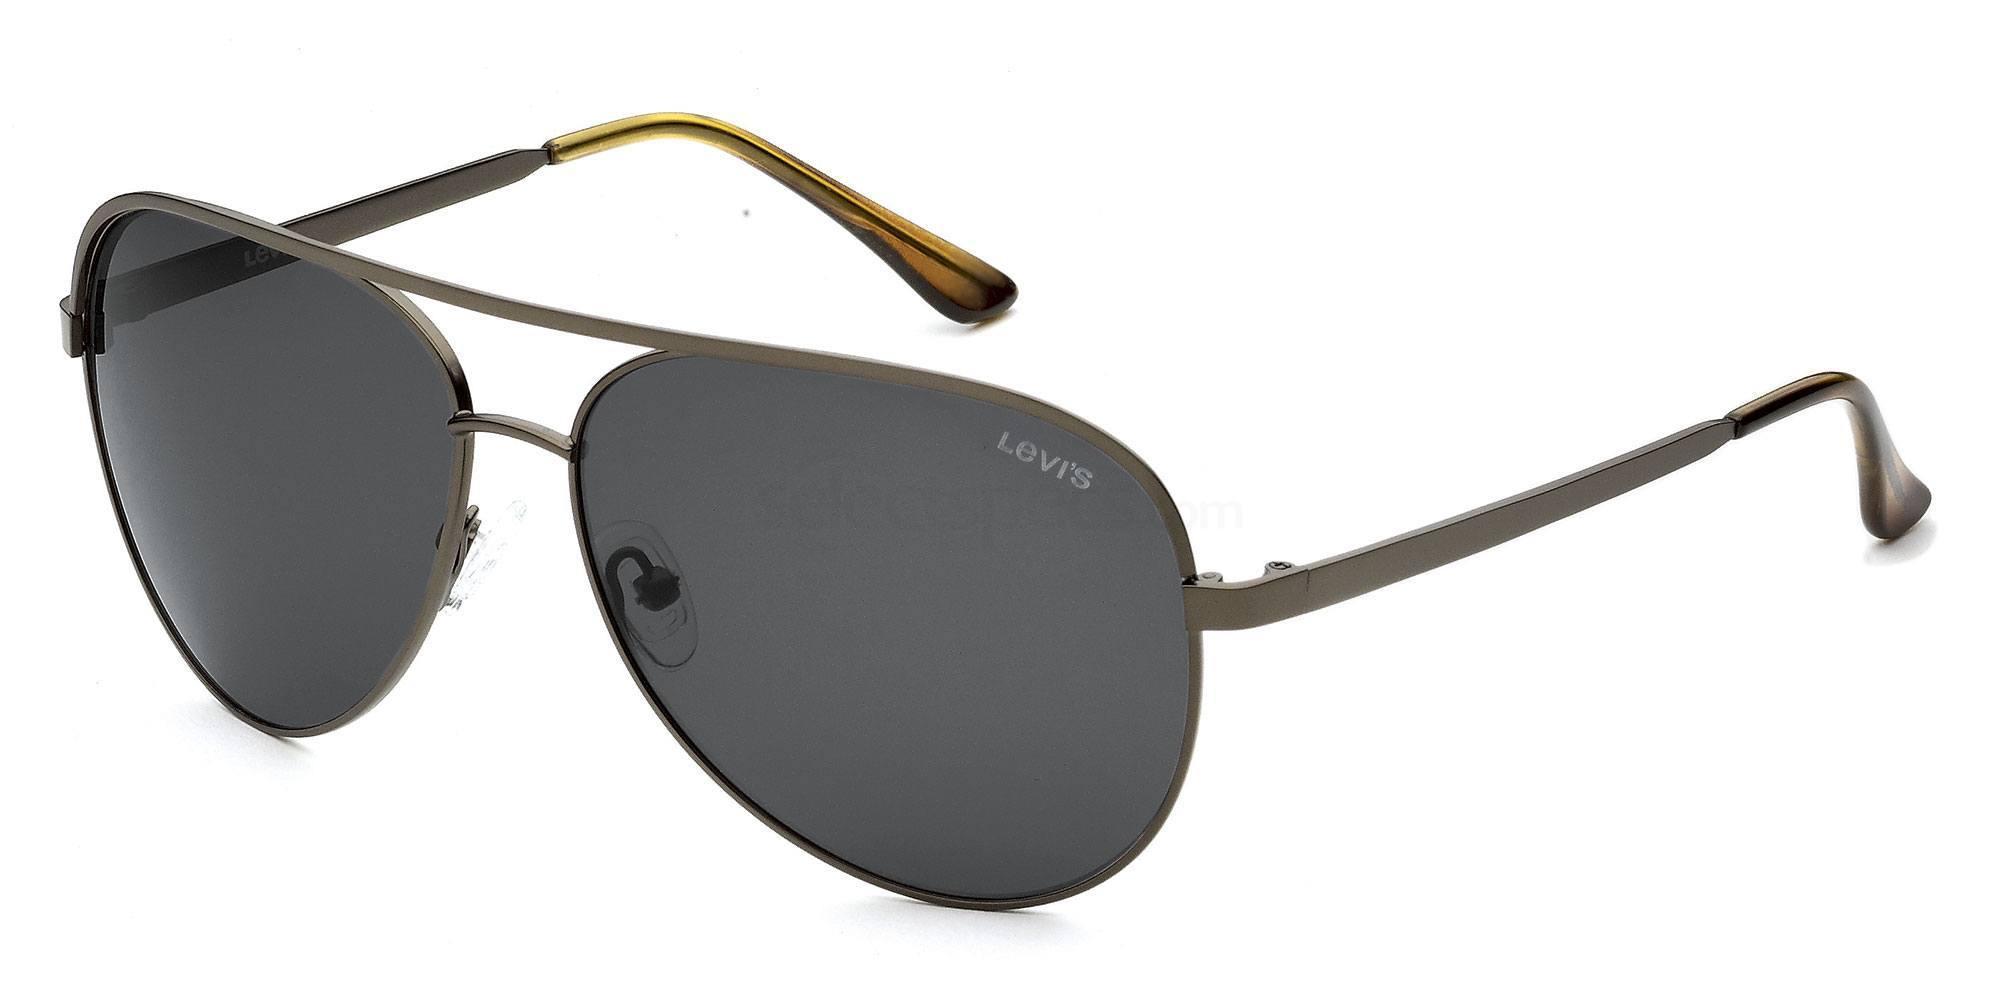 LO22363/02 LO22363 Sunglasses, Levi's Eyewear